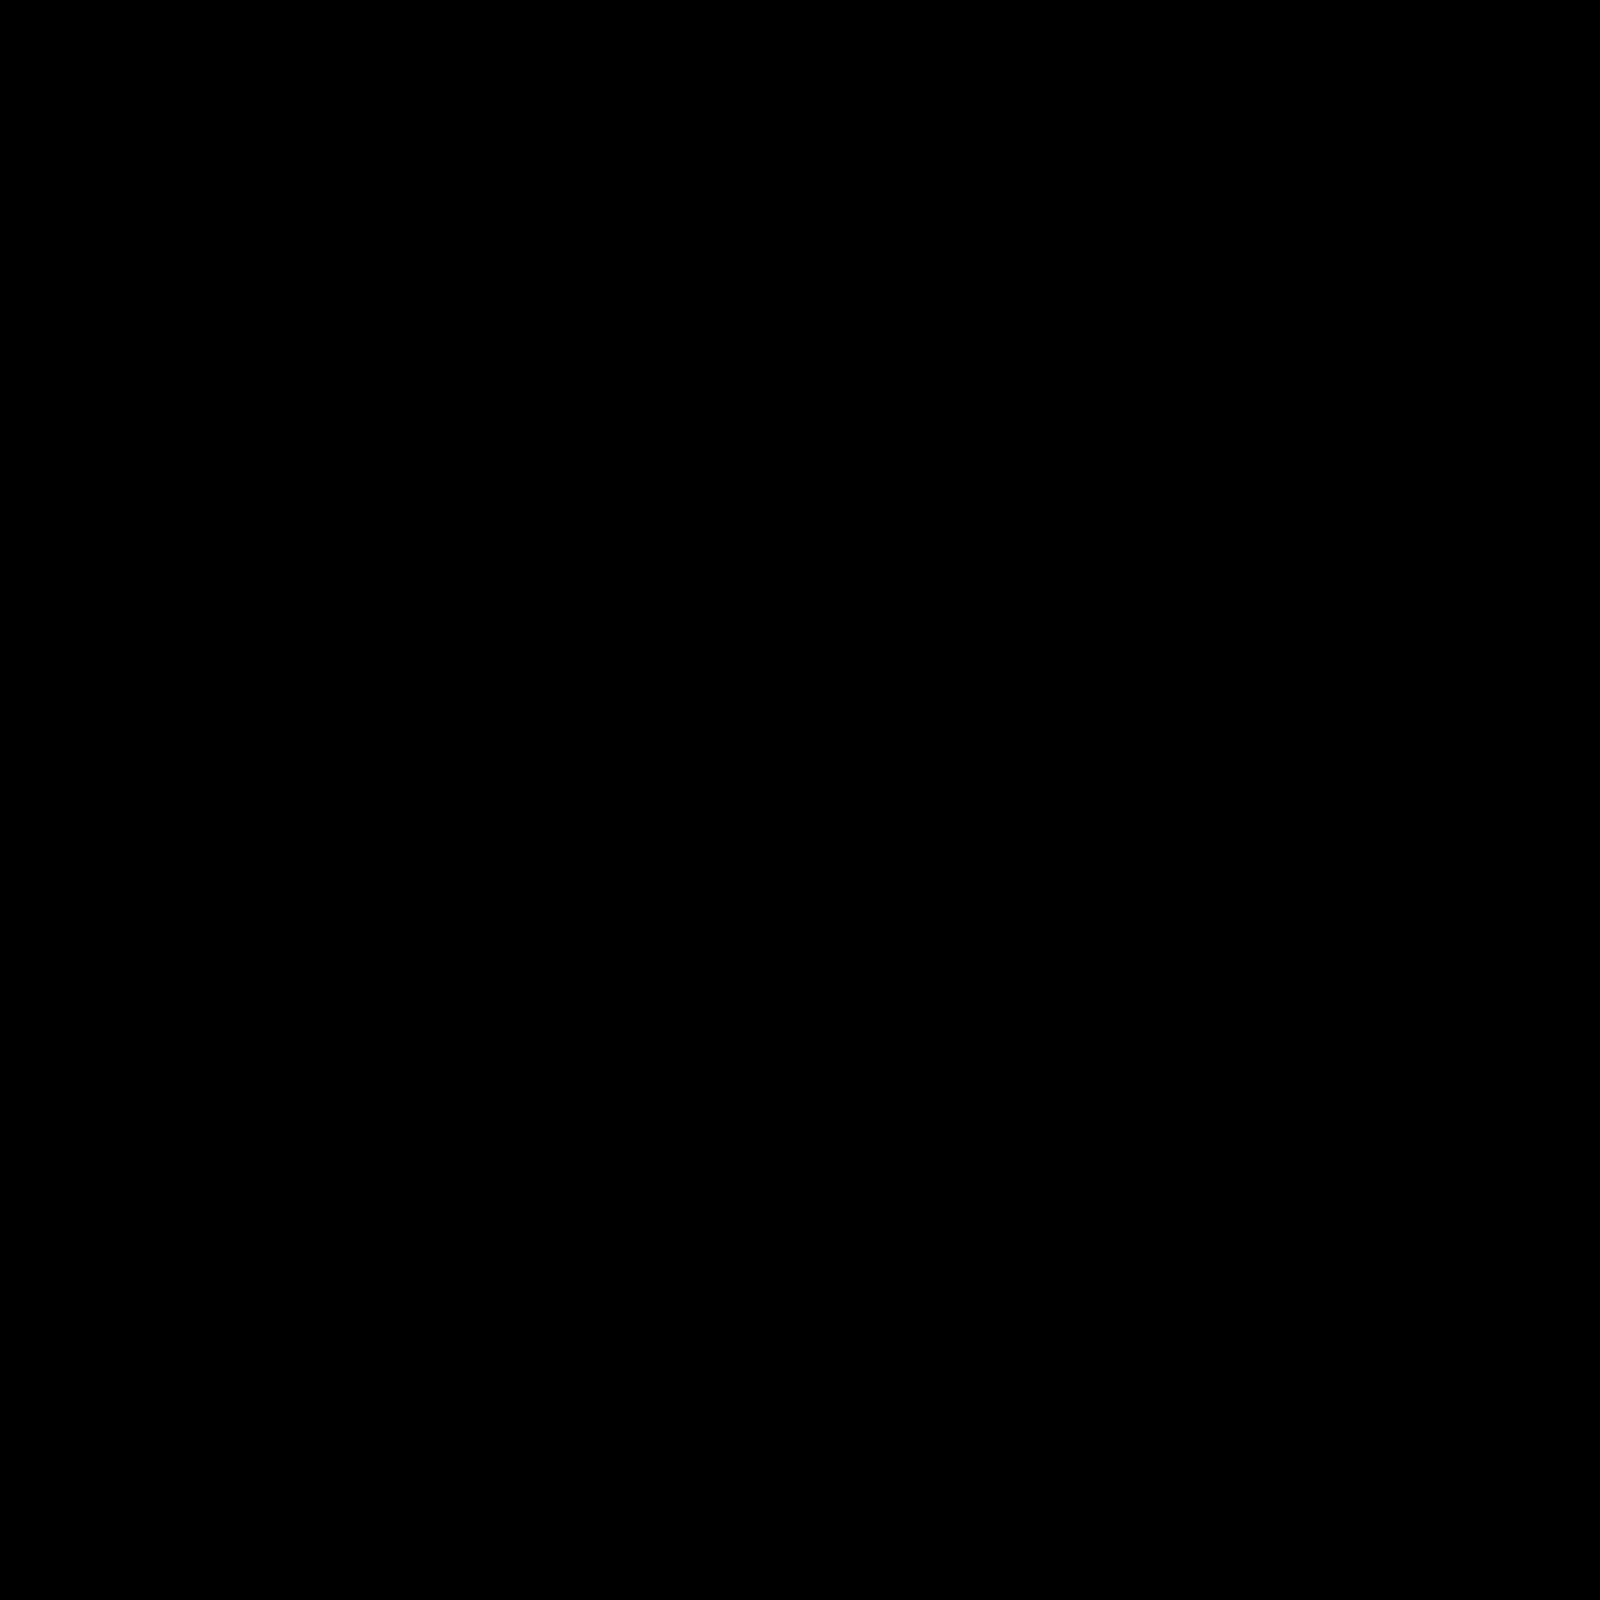 Vampiro icon